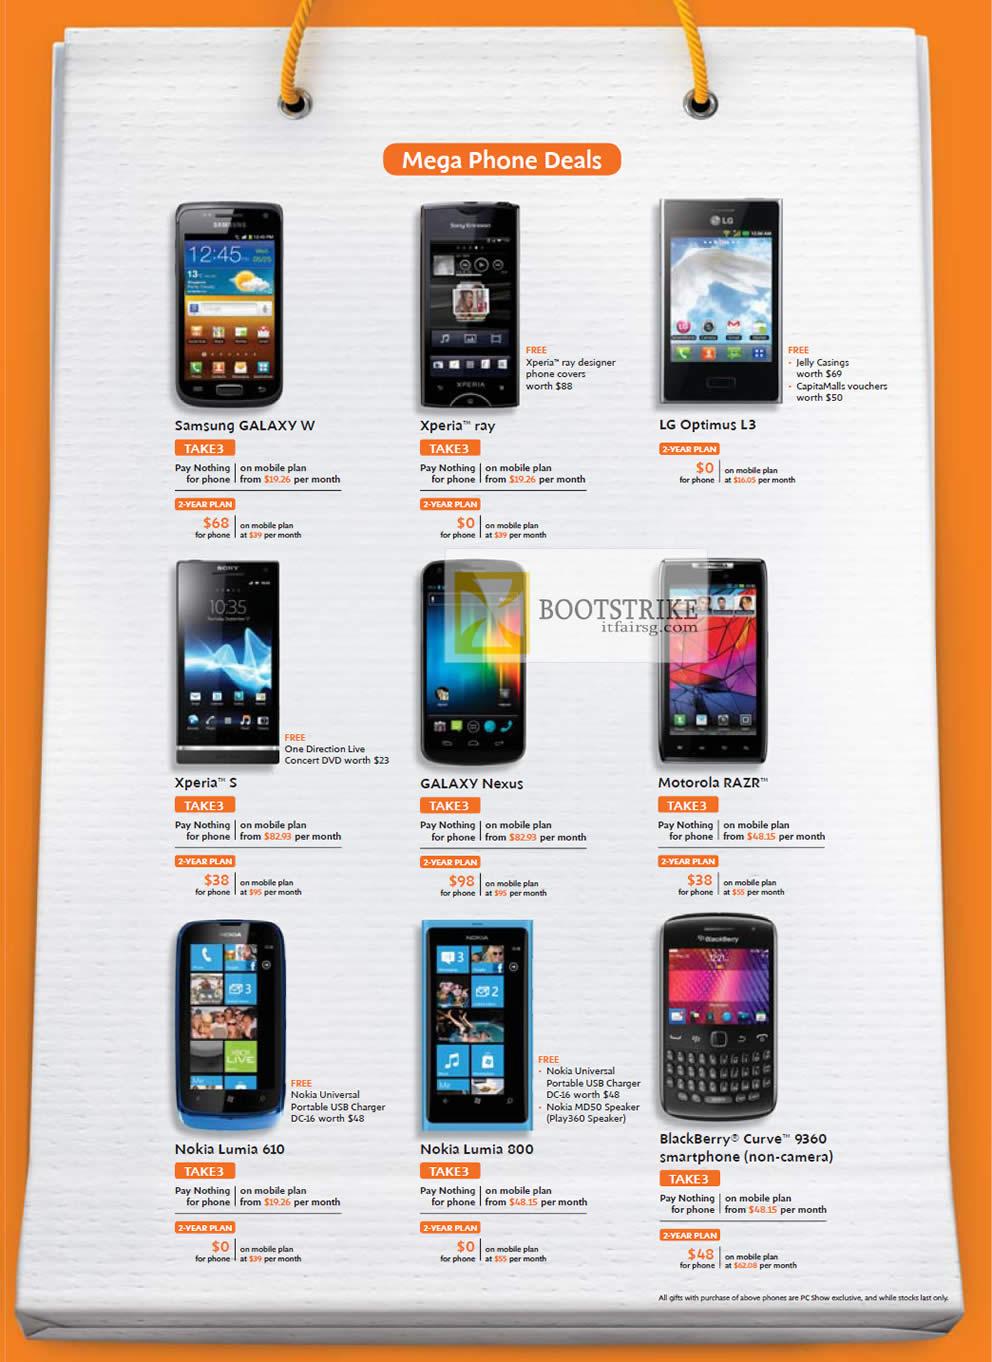 Samsung Galaxy W, Sony Xperia Ray, Sony Xperia S, LG Optimus L3, Galaxy Nexus, Motorola Razr, Nokia Lumia 610, Nokia Lumia 800, Blackberry Curve 9360